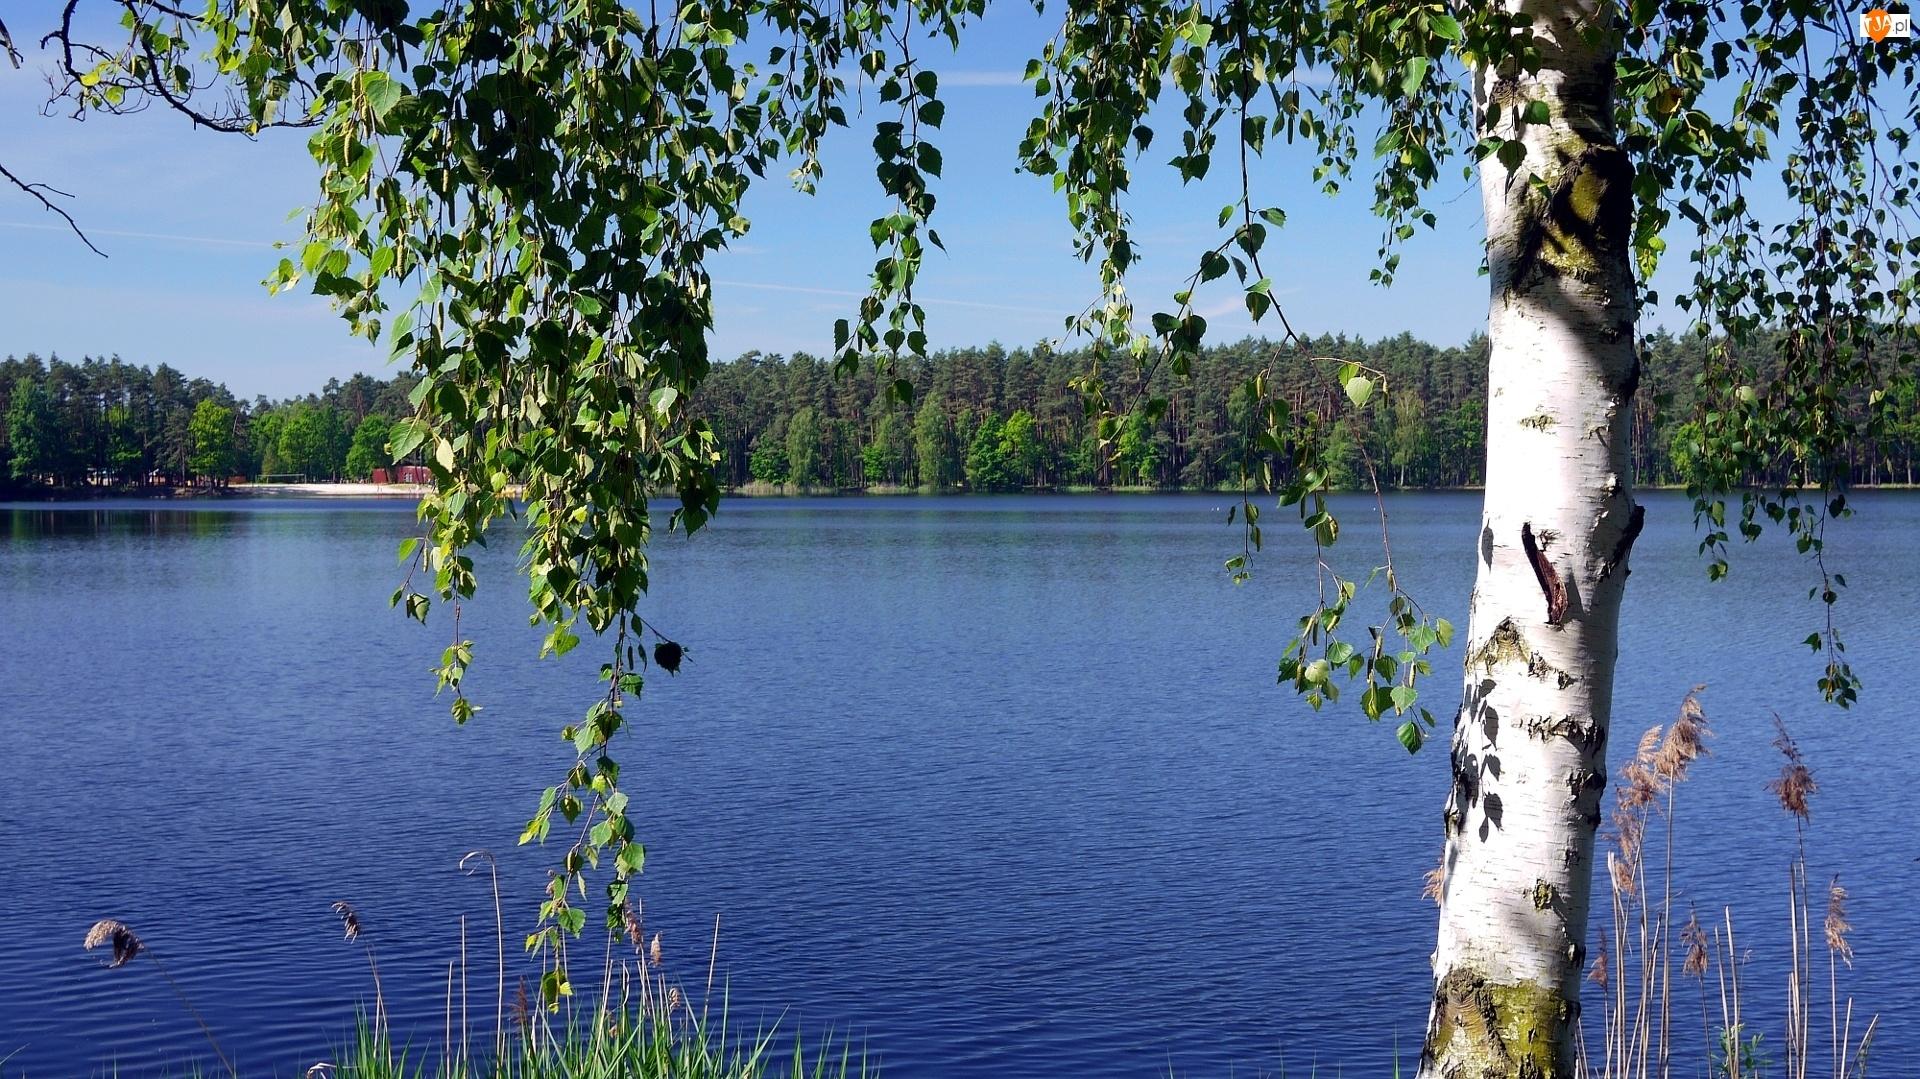 Jezioro, Brzoza, Las, Drzewo